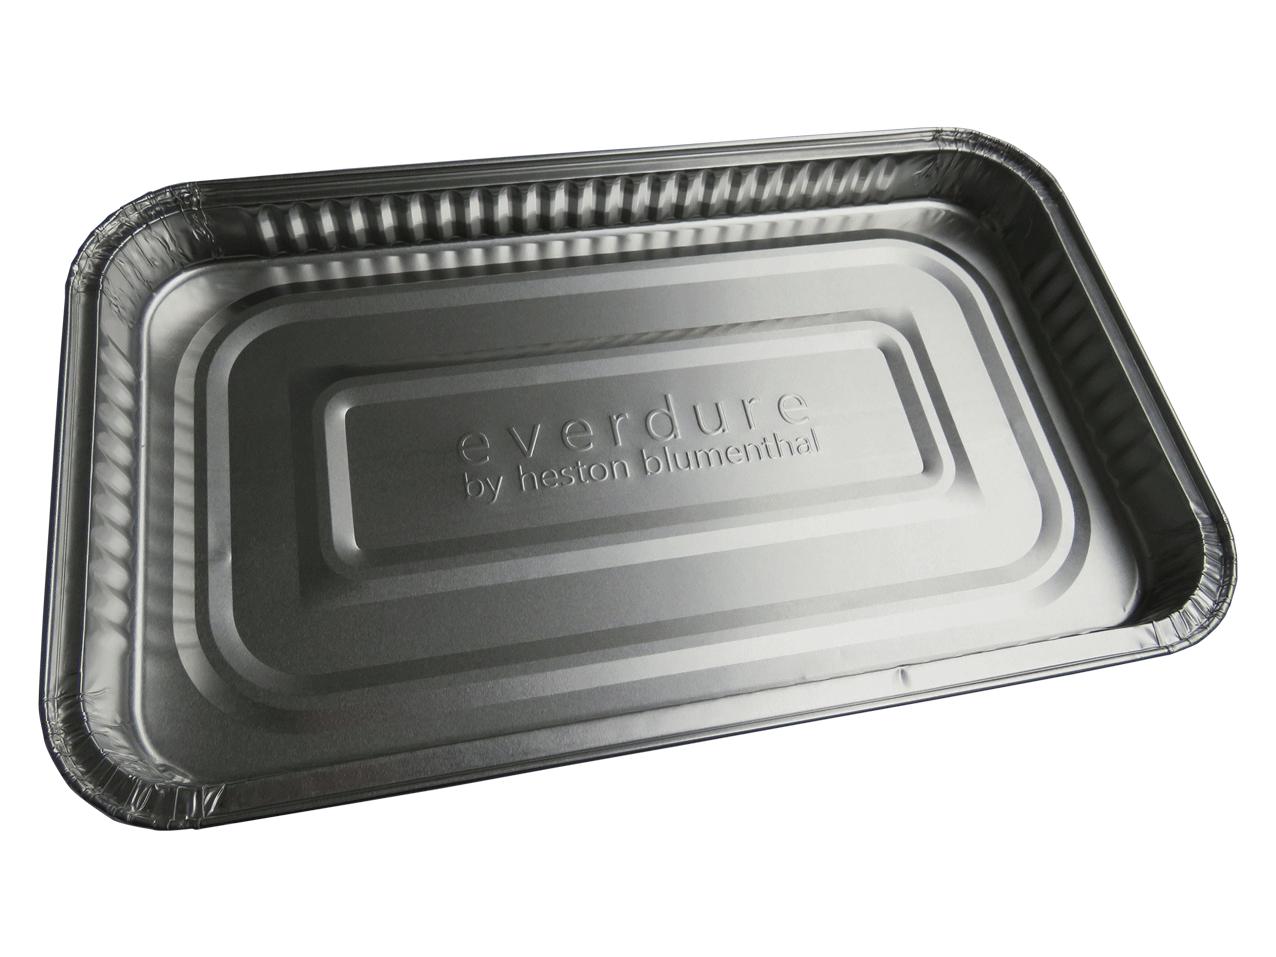 Aluminium Abtropfschale - Force und Furnace